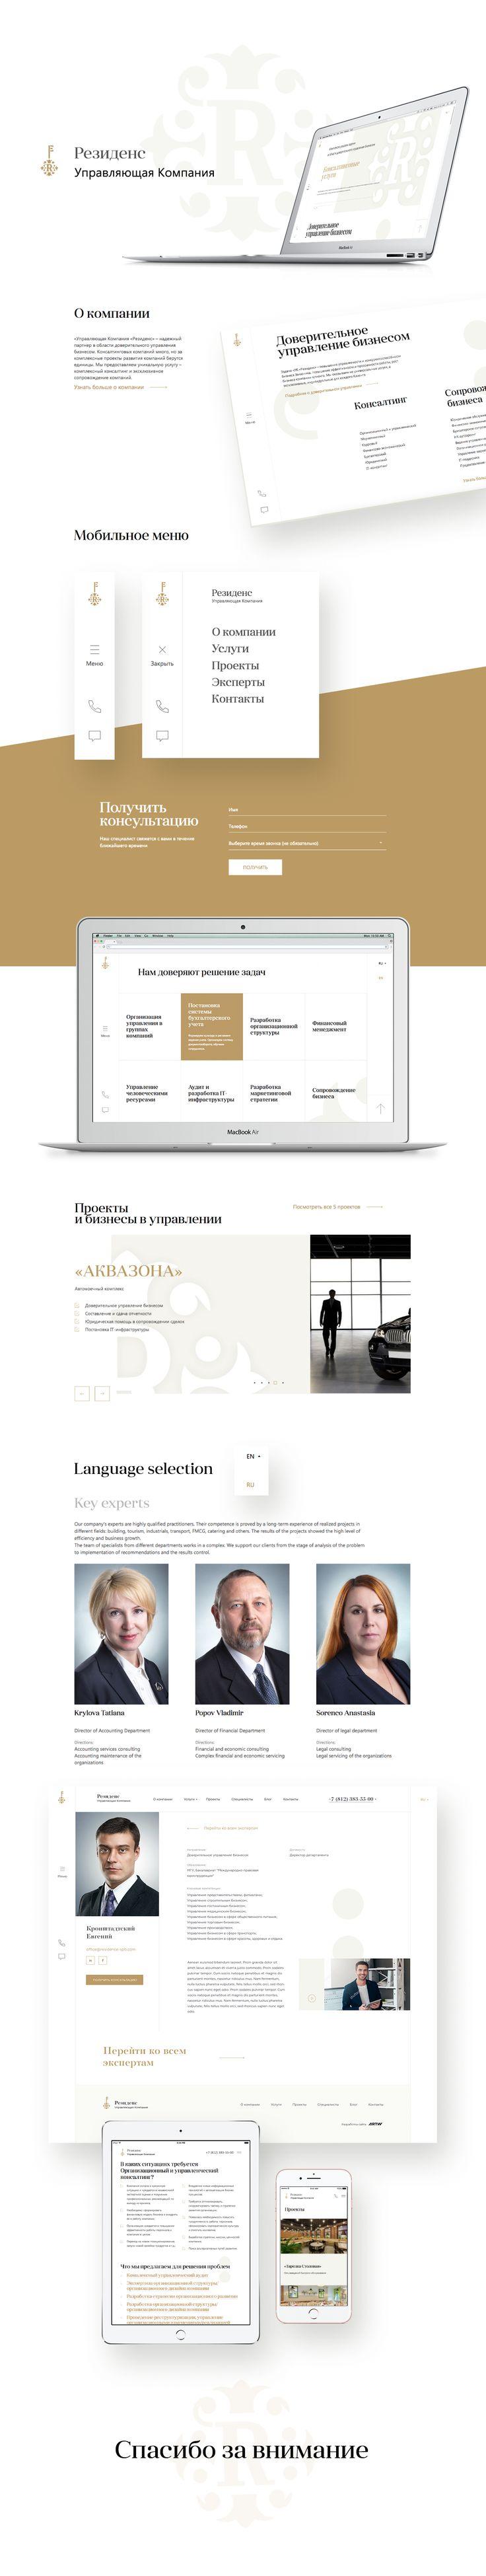 Residence: Управляющая компания, Site © ARTW